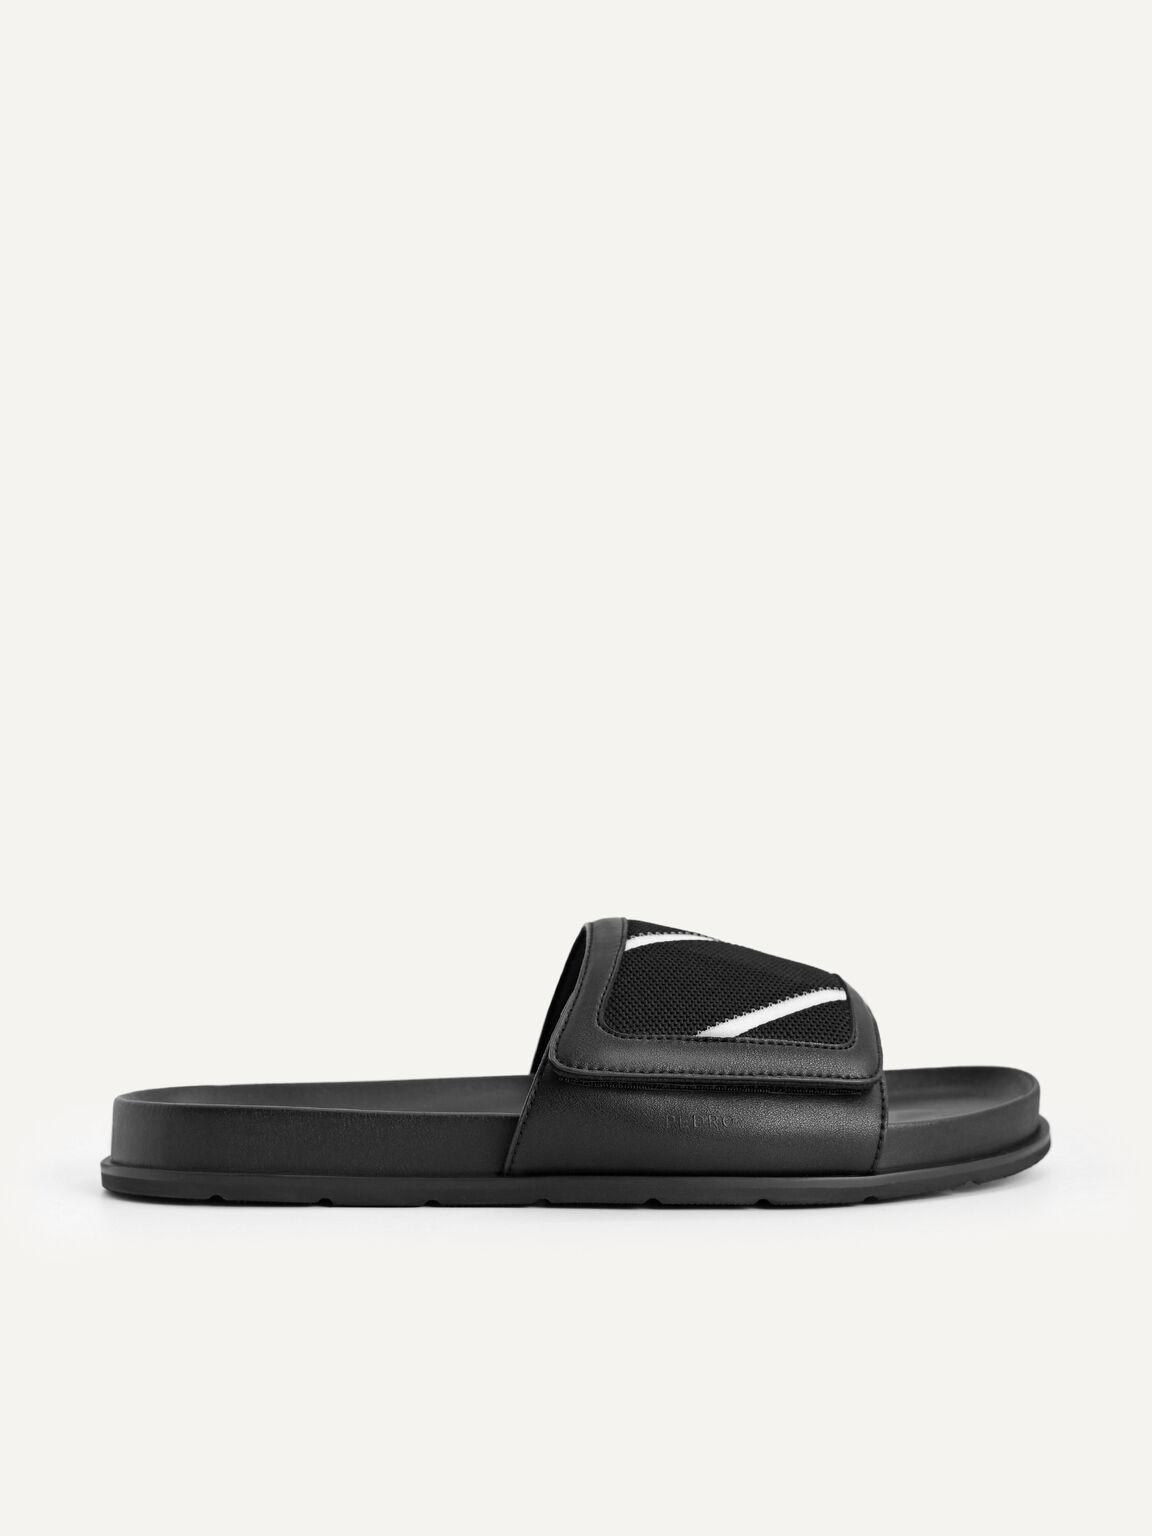 前帶式涼鞋, 黑色, hi-res